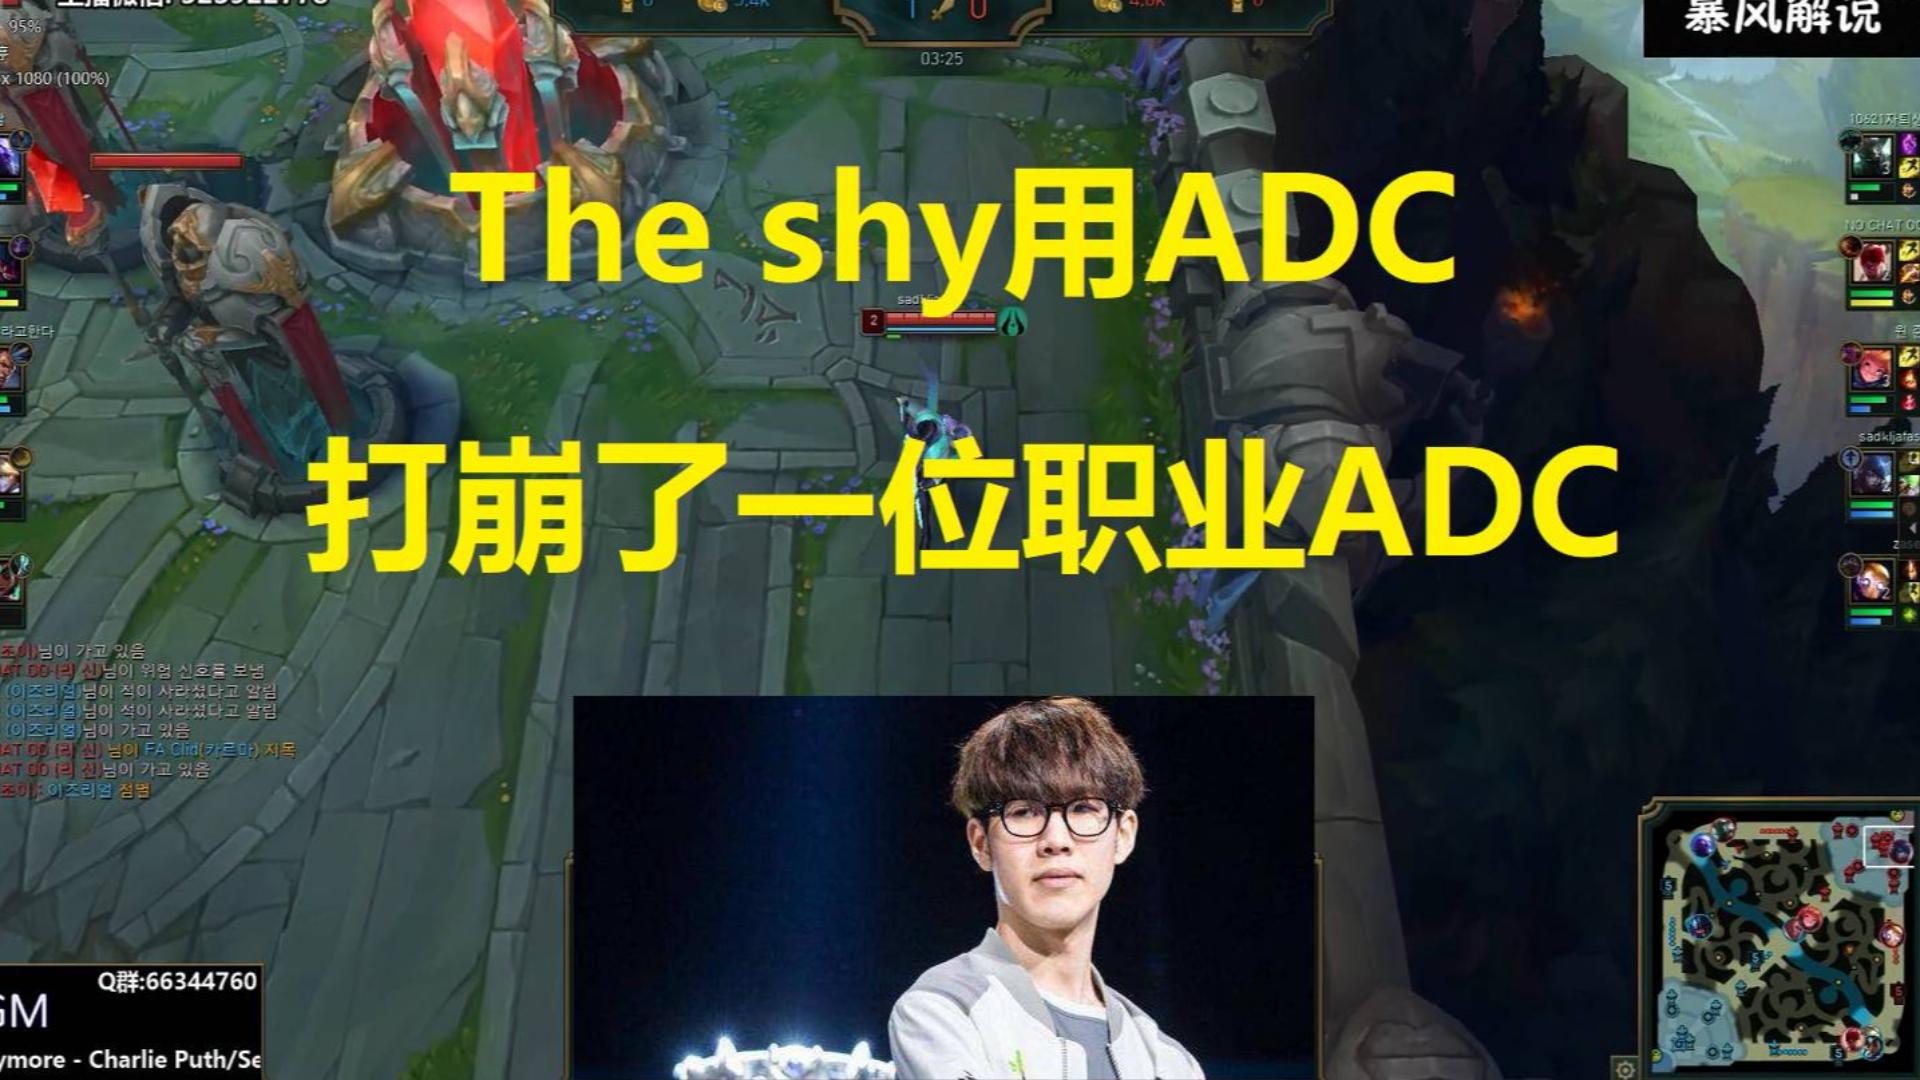 The shy用ADC打崩了一位职业ADC?